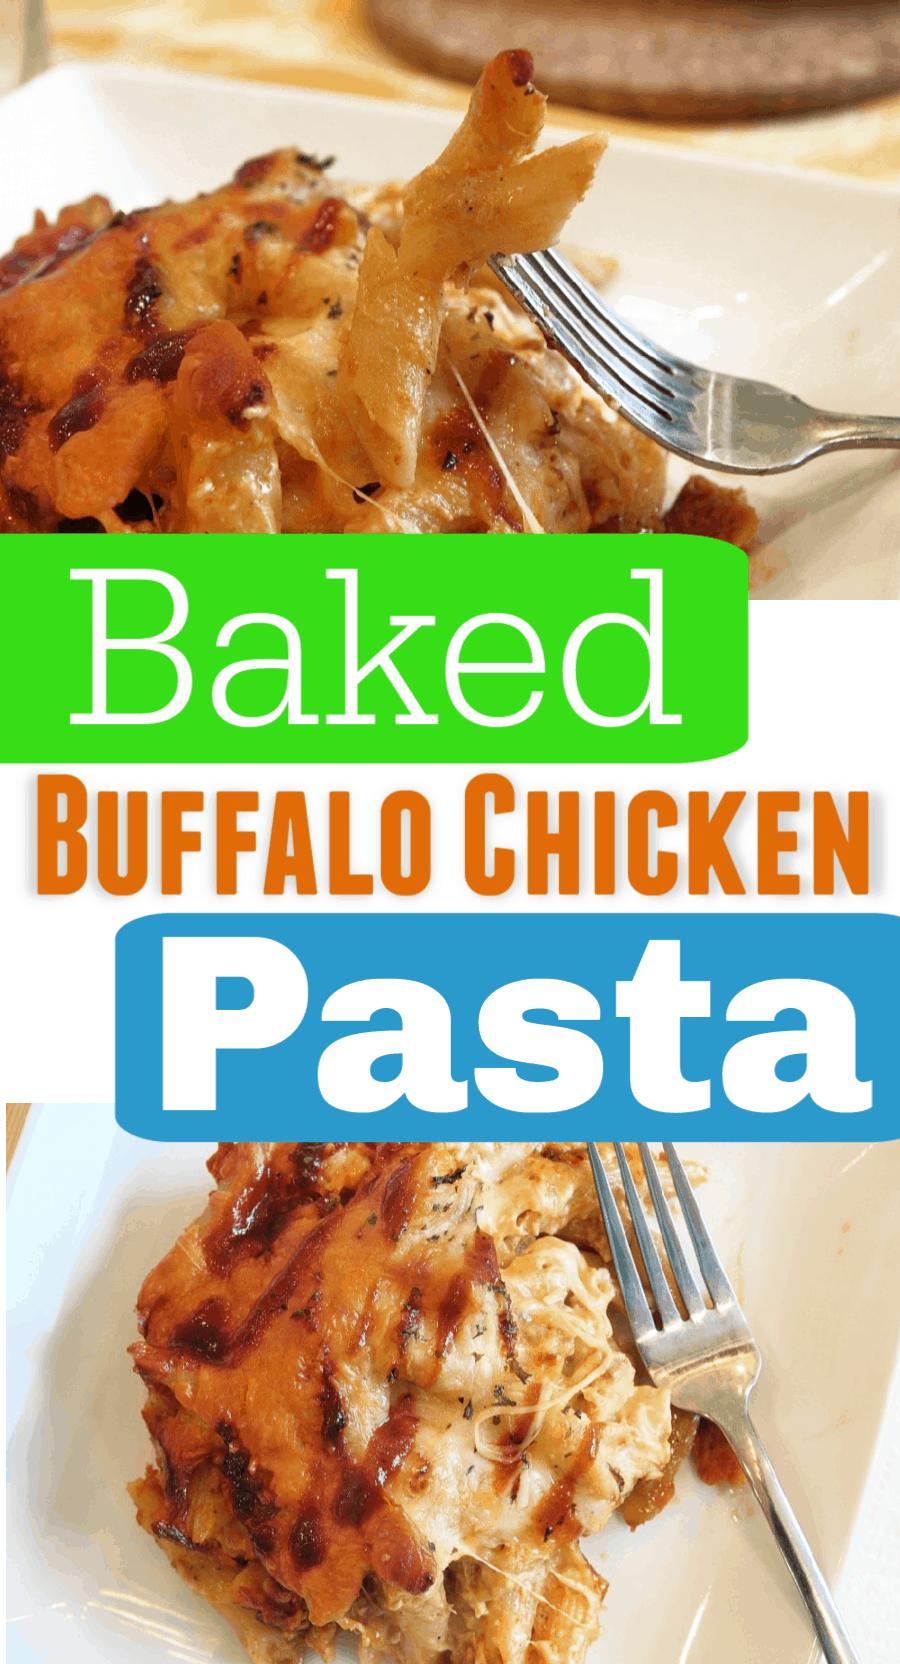 Baked Buffalo Chicken Pasta Recipe